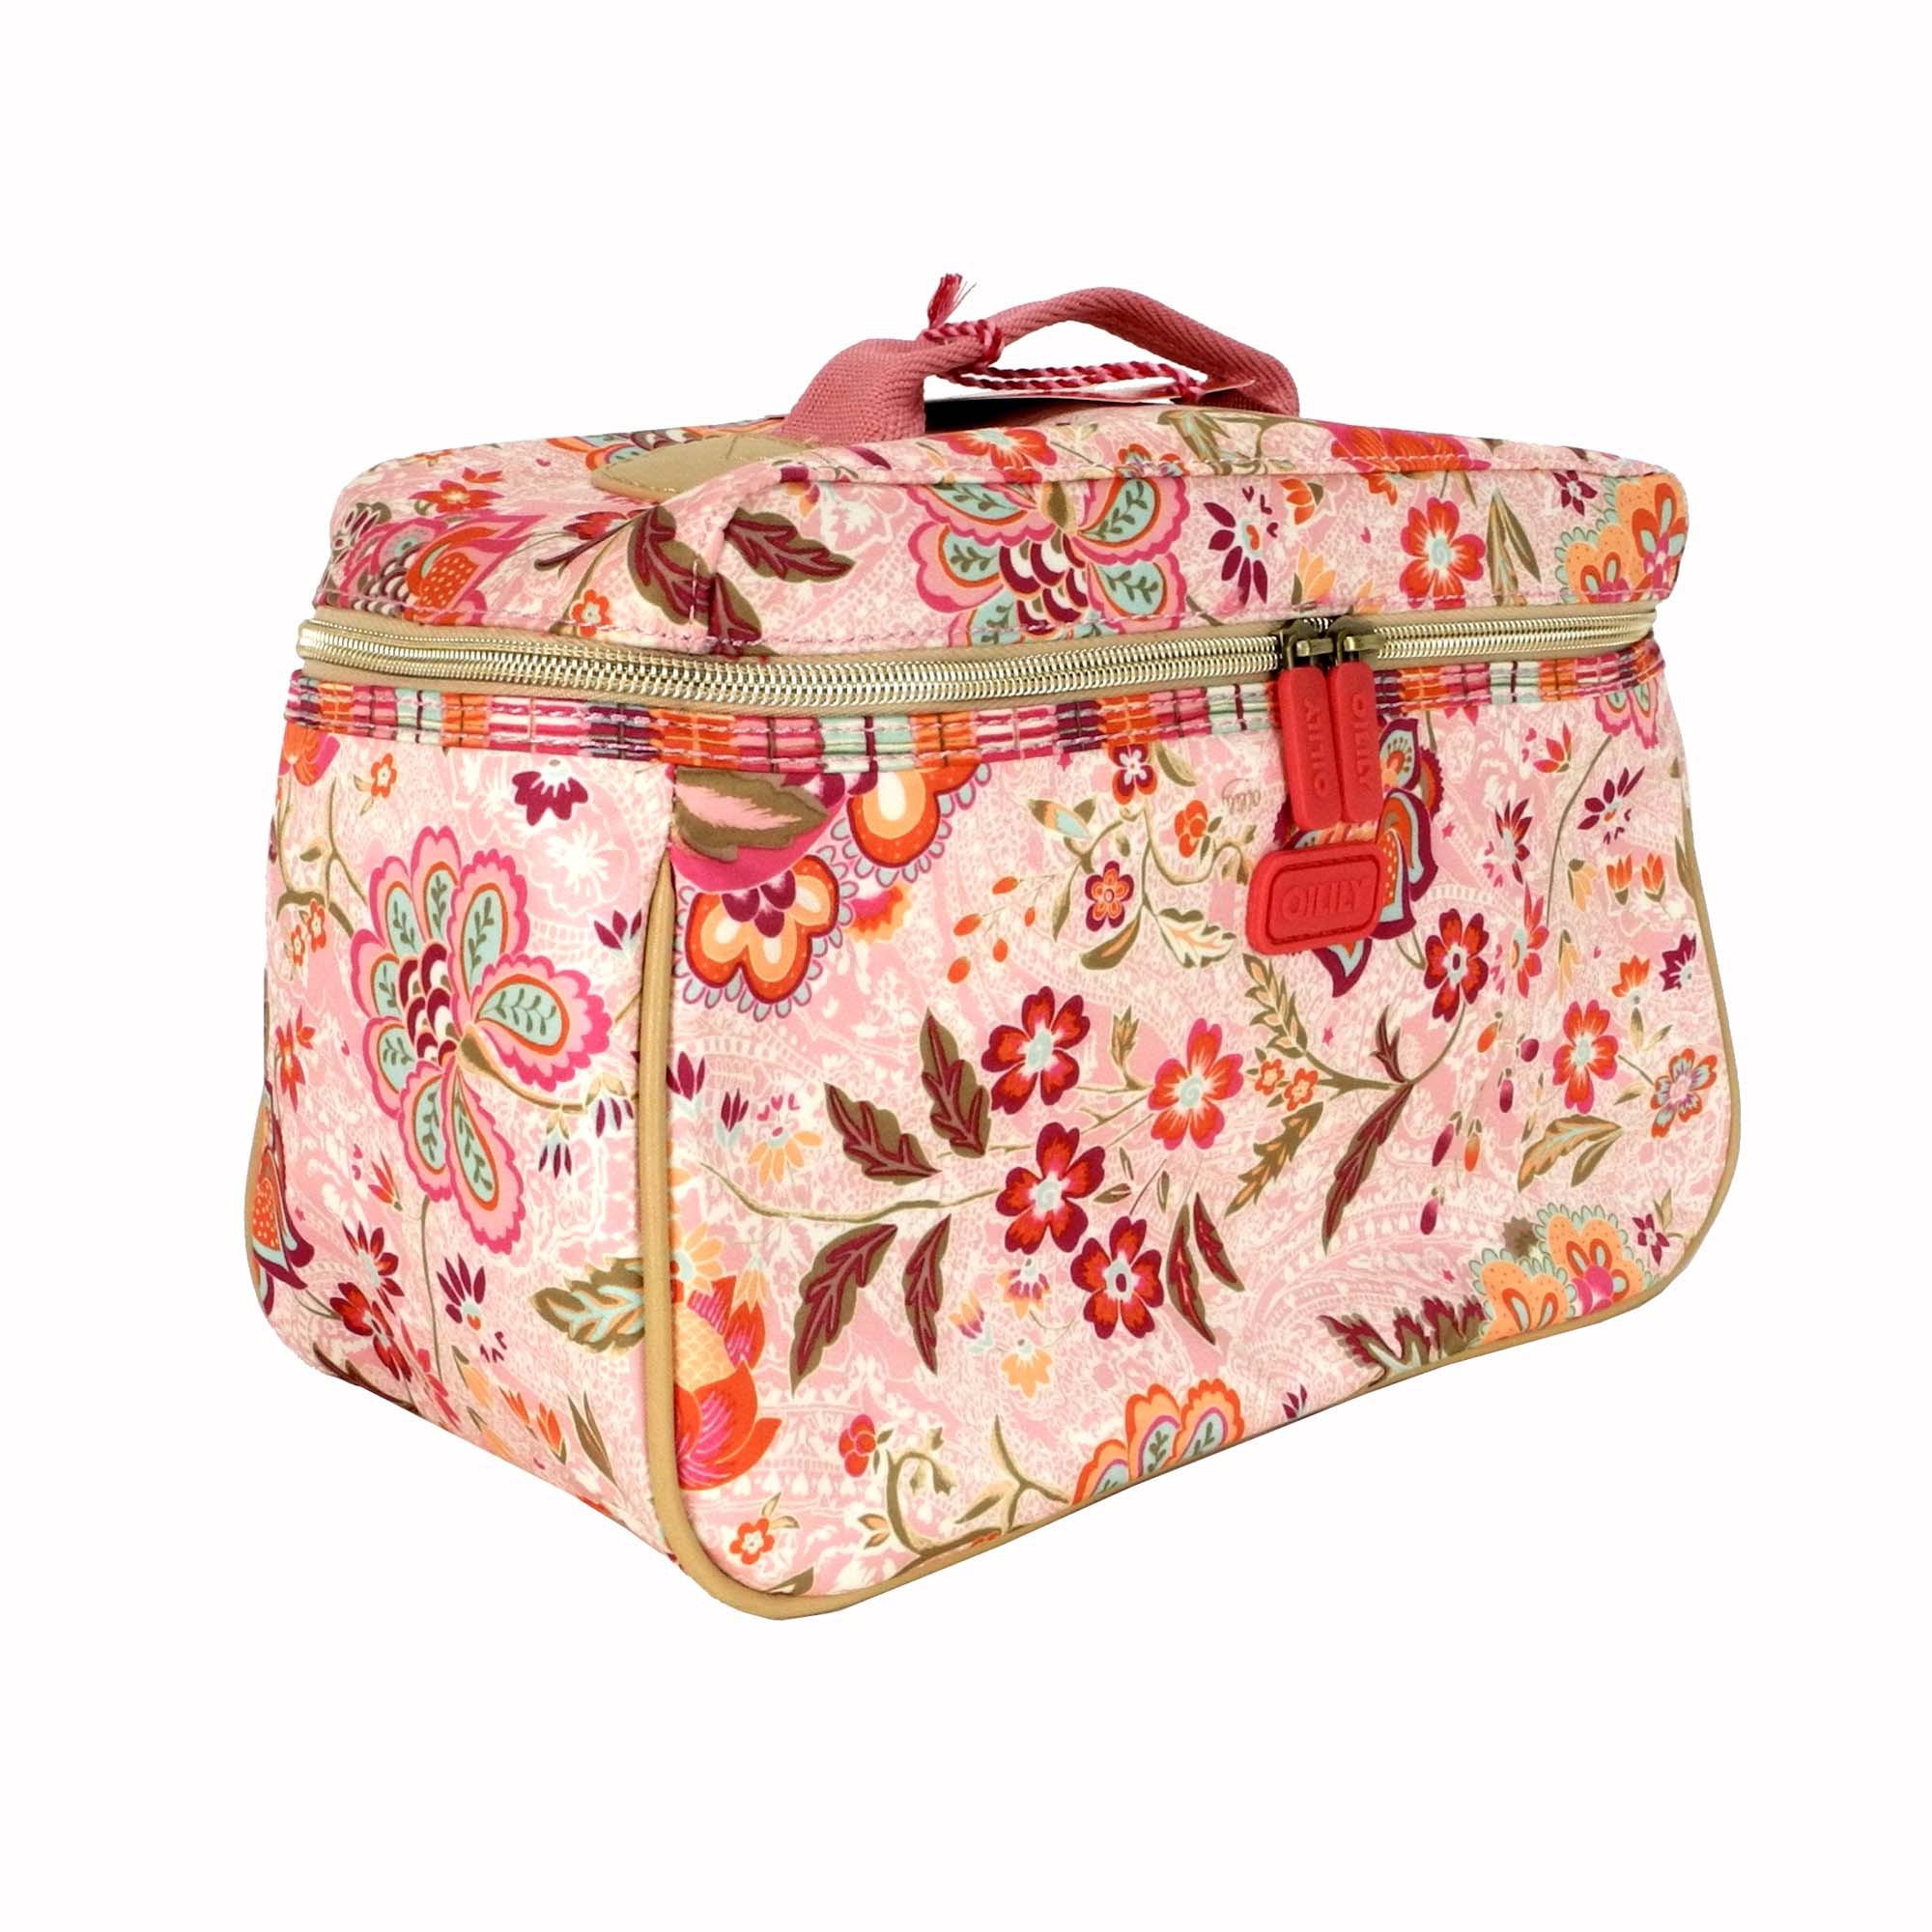 oilily summer blossom kosmetiktasche l beauty case peach ausverkauft. Black Bedroom Furniture Sets. Home Design Ideas